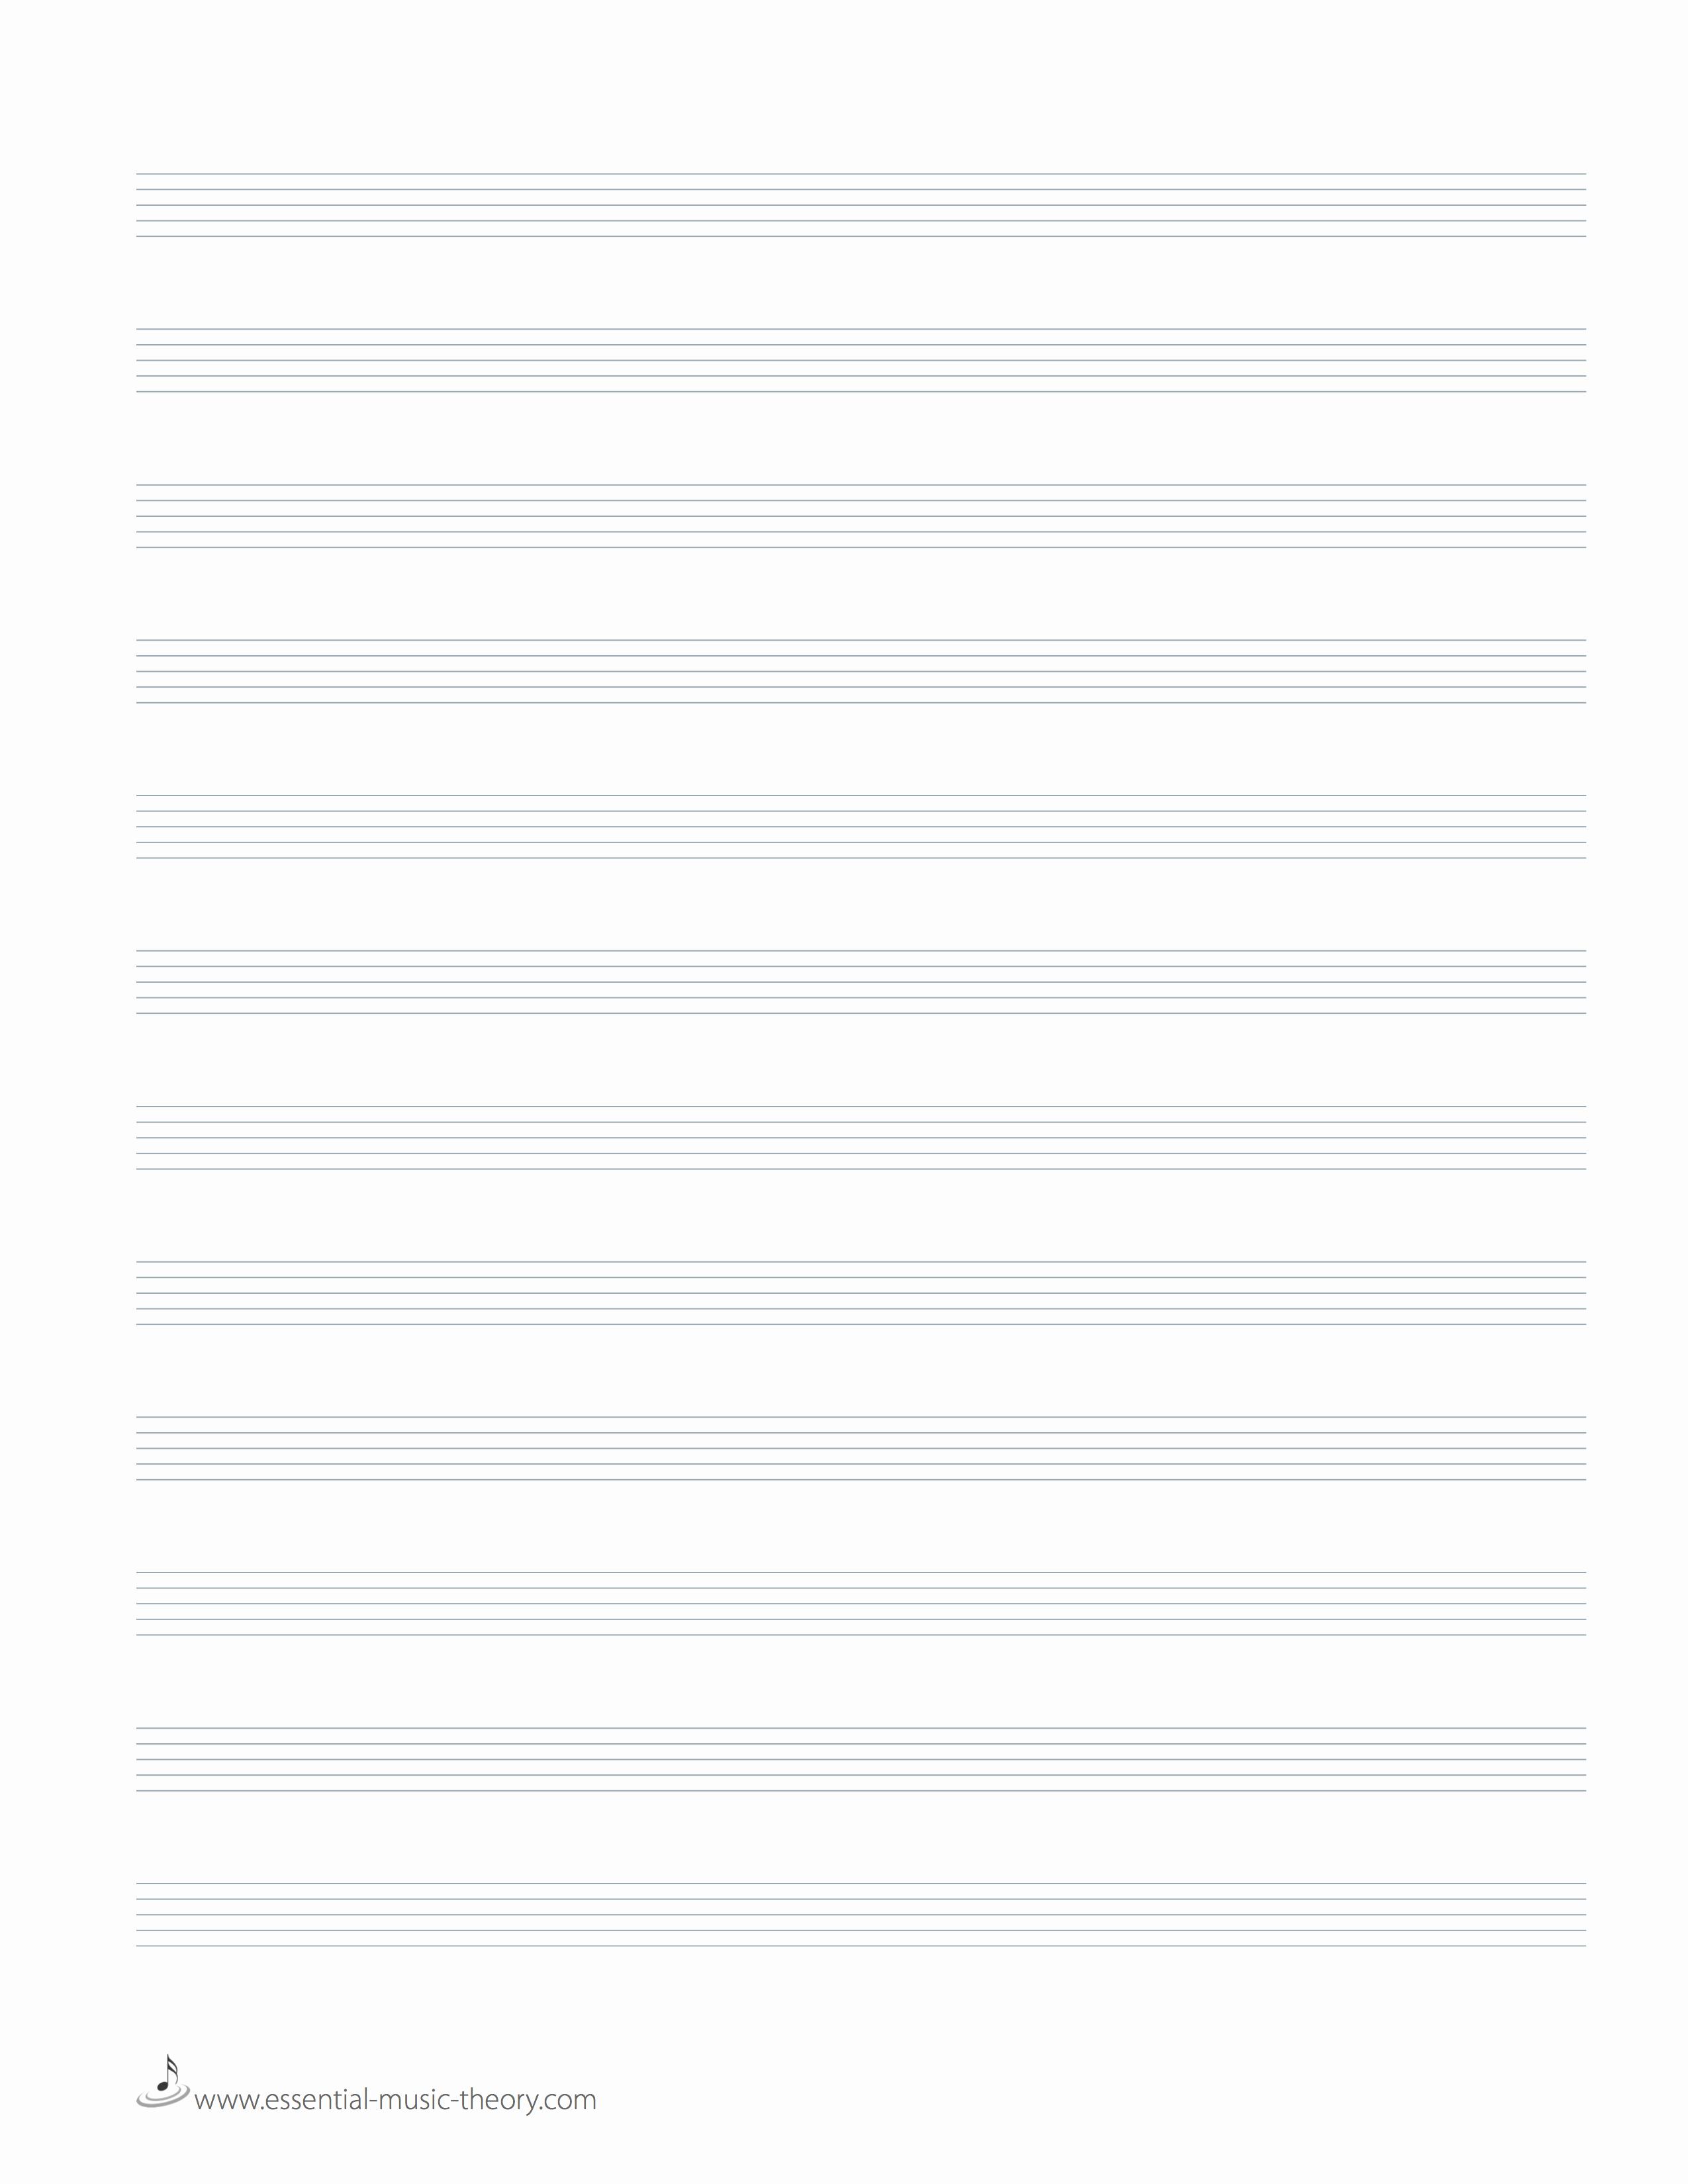 12 Stave Manuscript Paper Pdf Awesome Blank Manuscript Paper